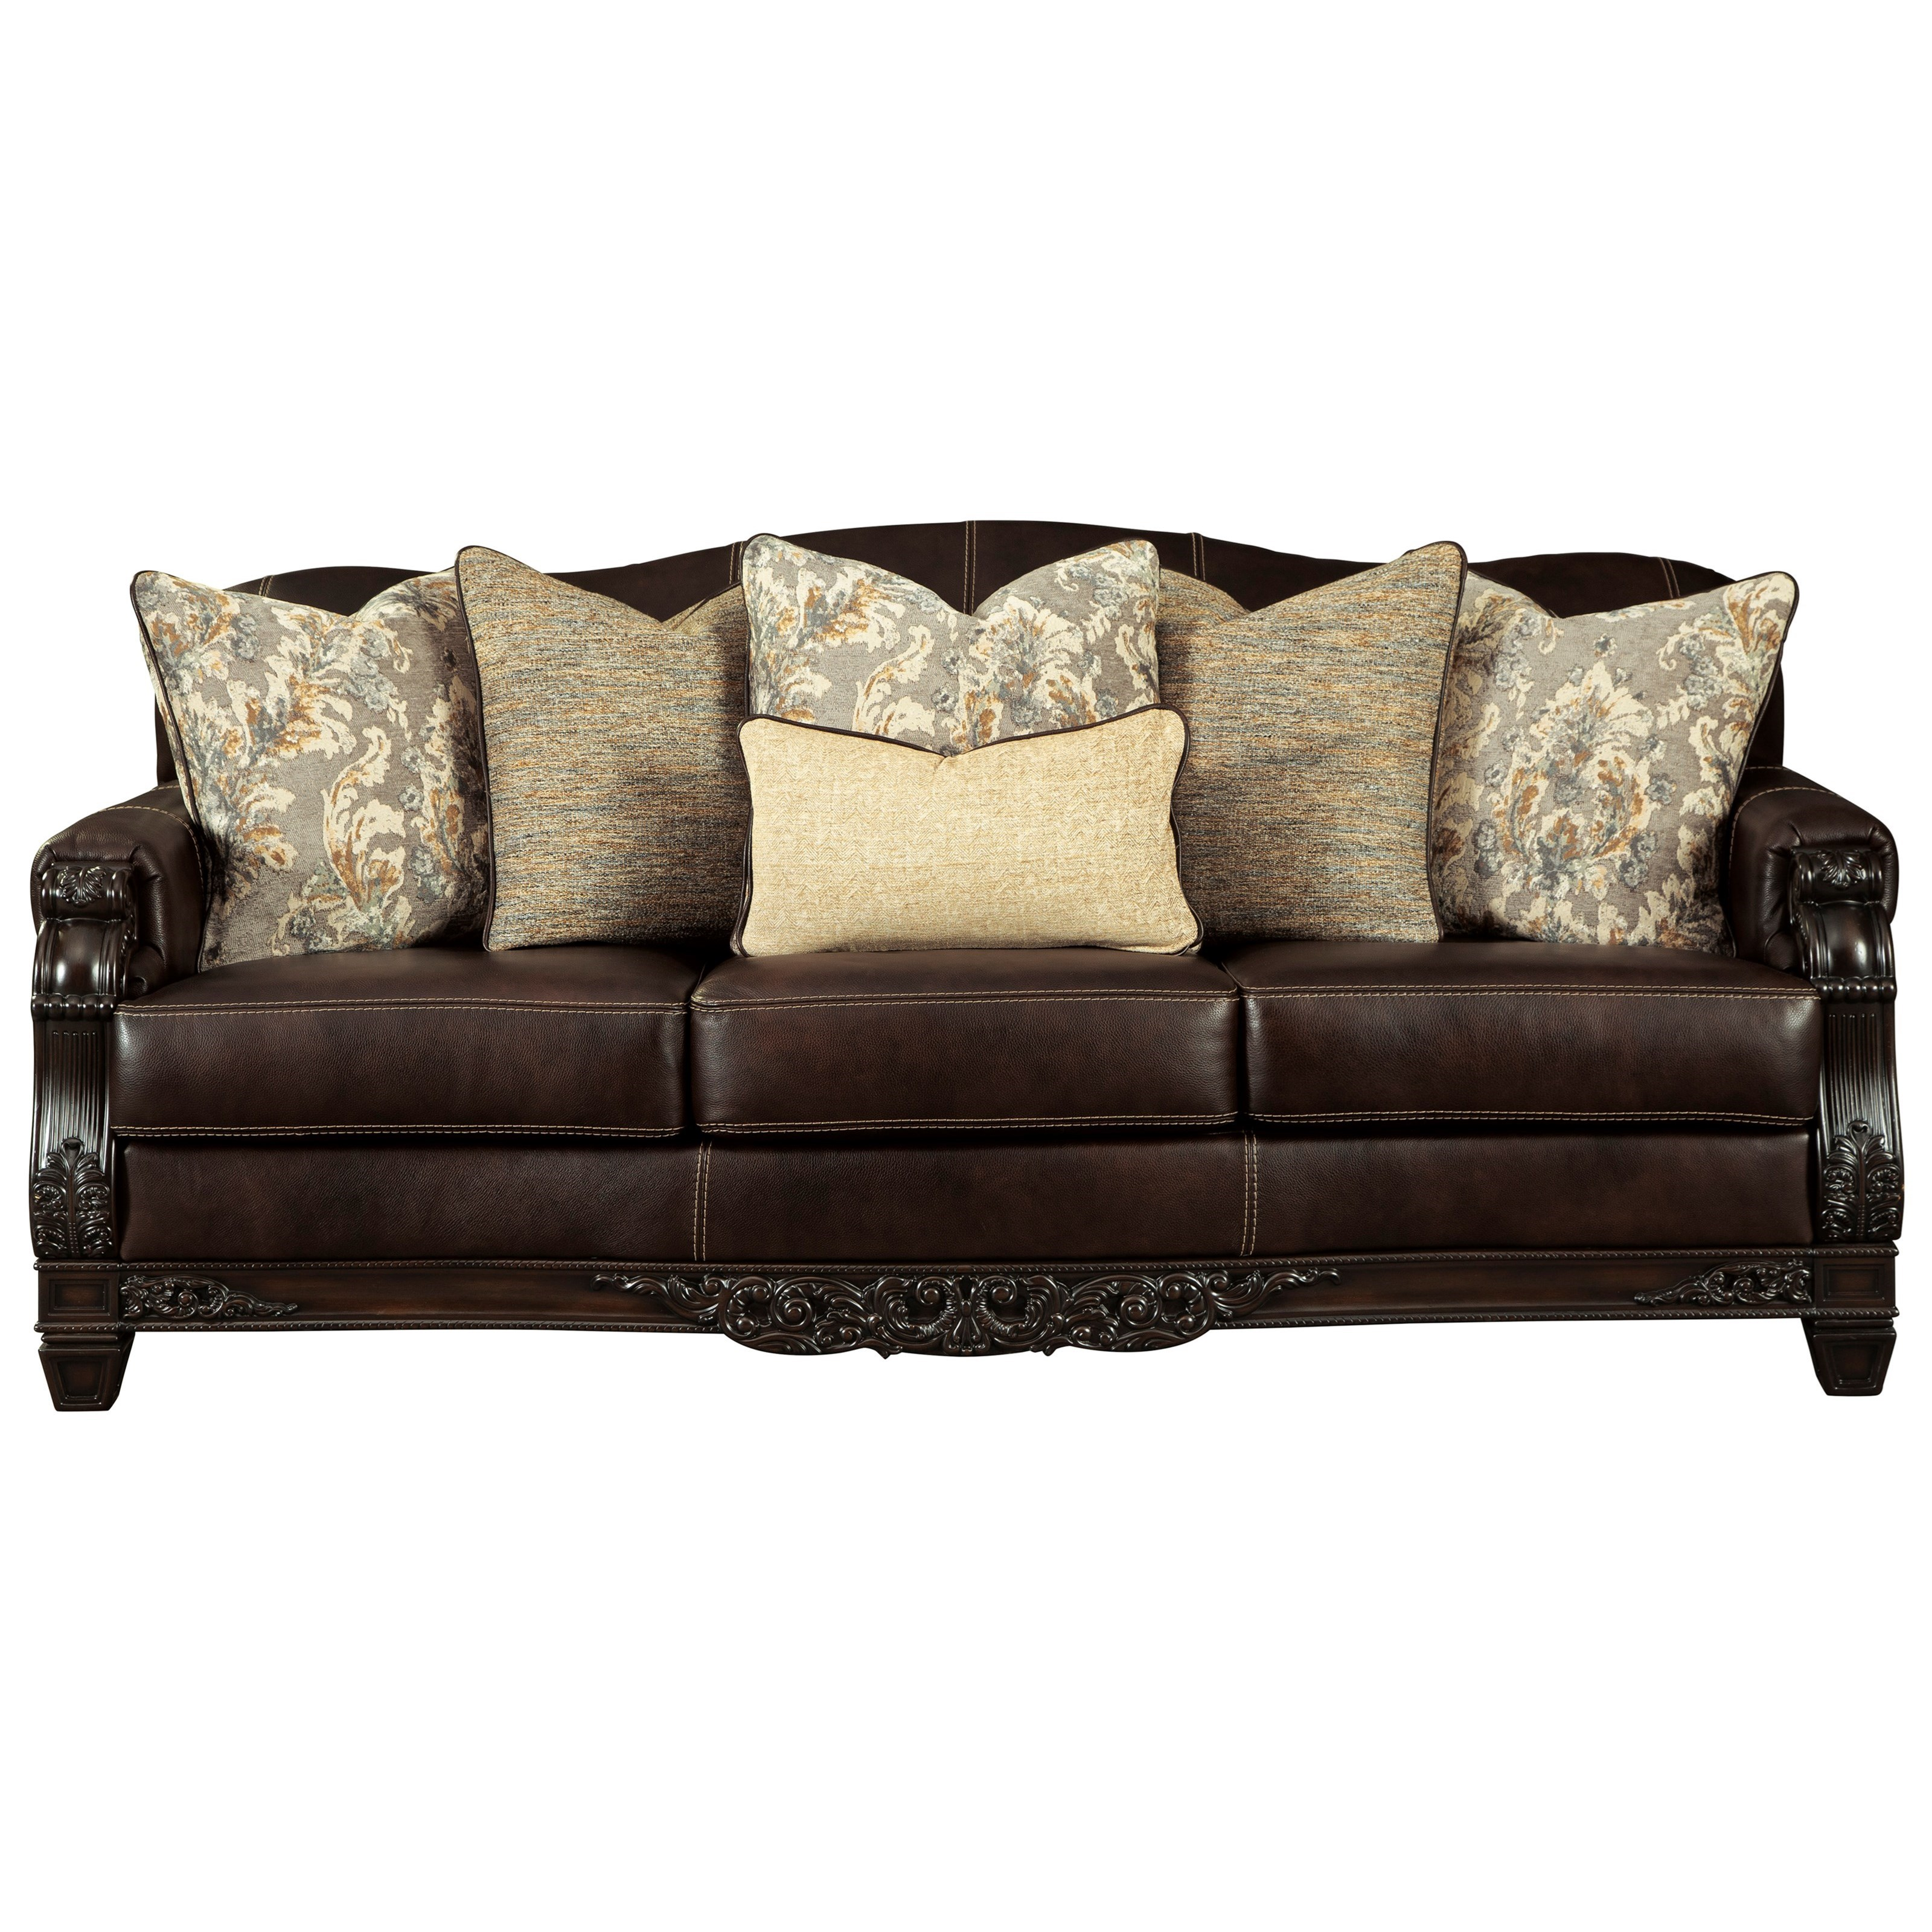 Embrook Sofa by Ashley (Signature Design) at Johnny Janosik